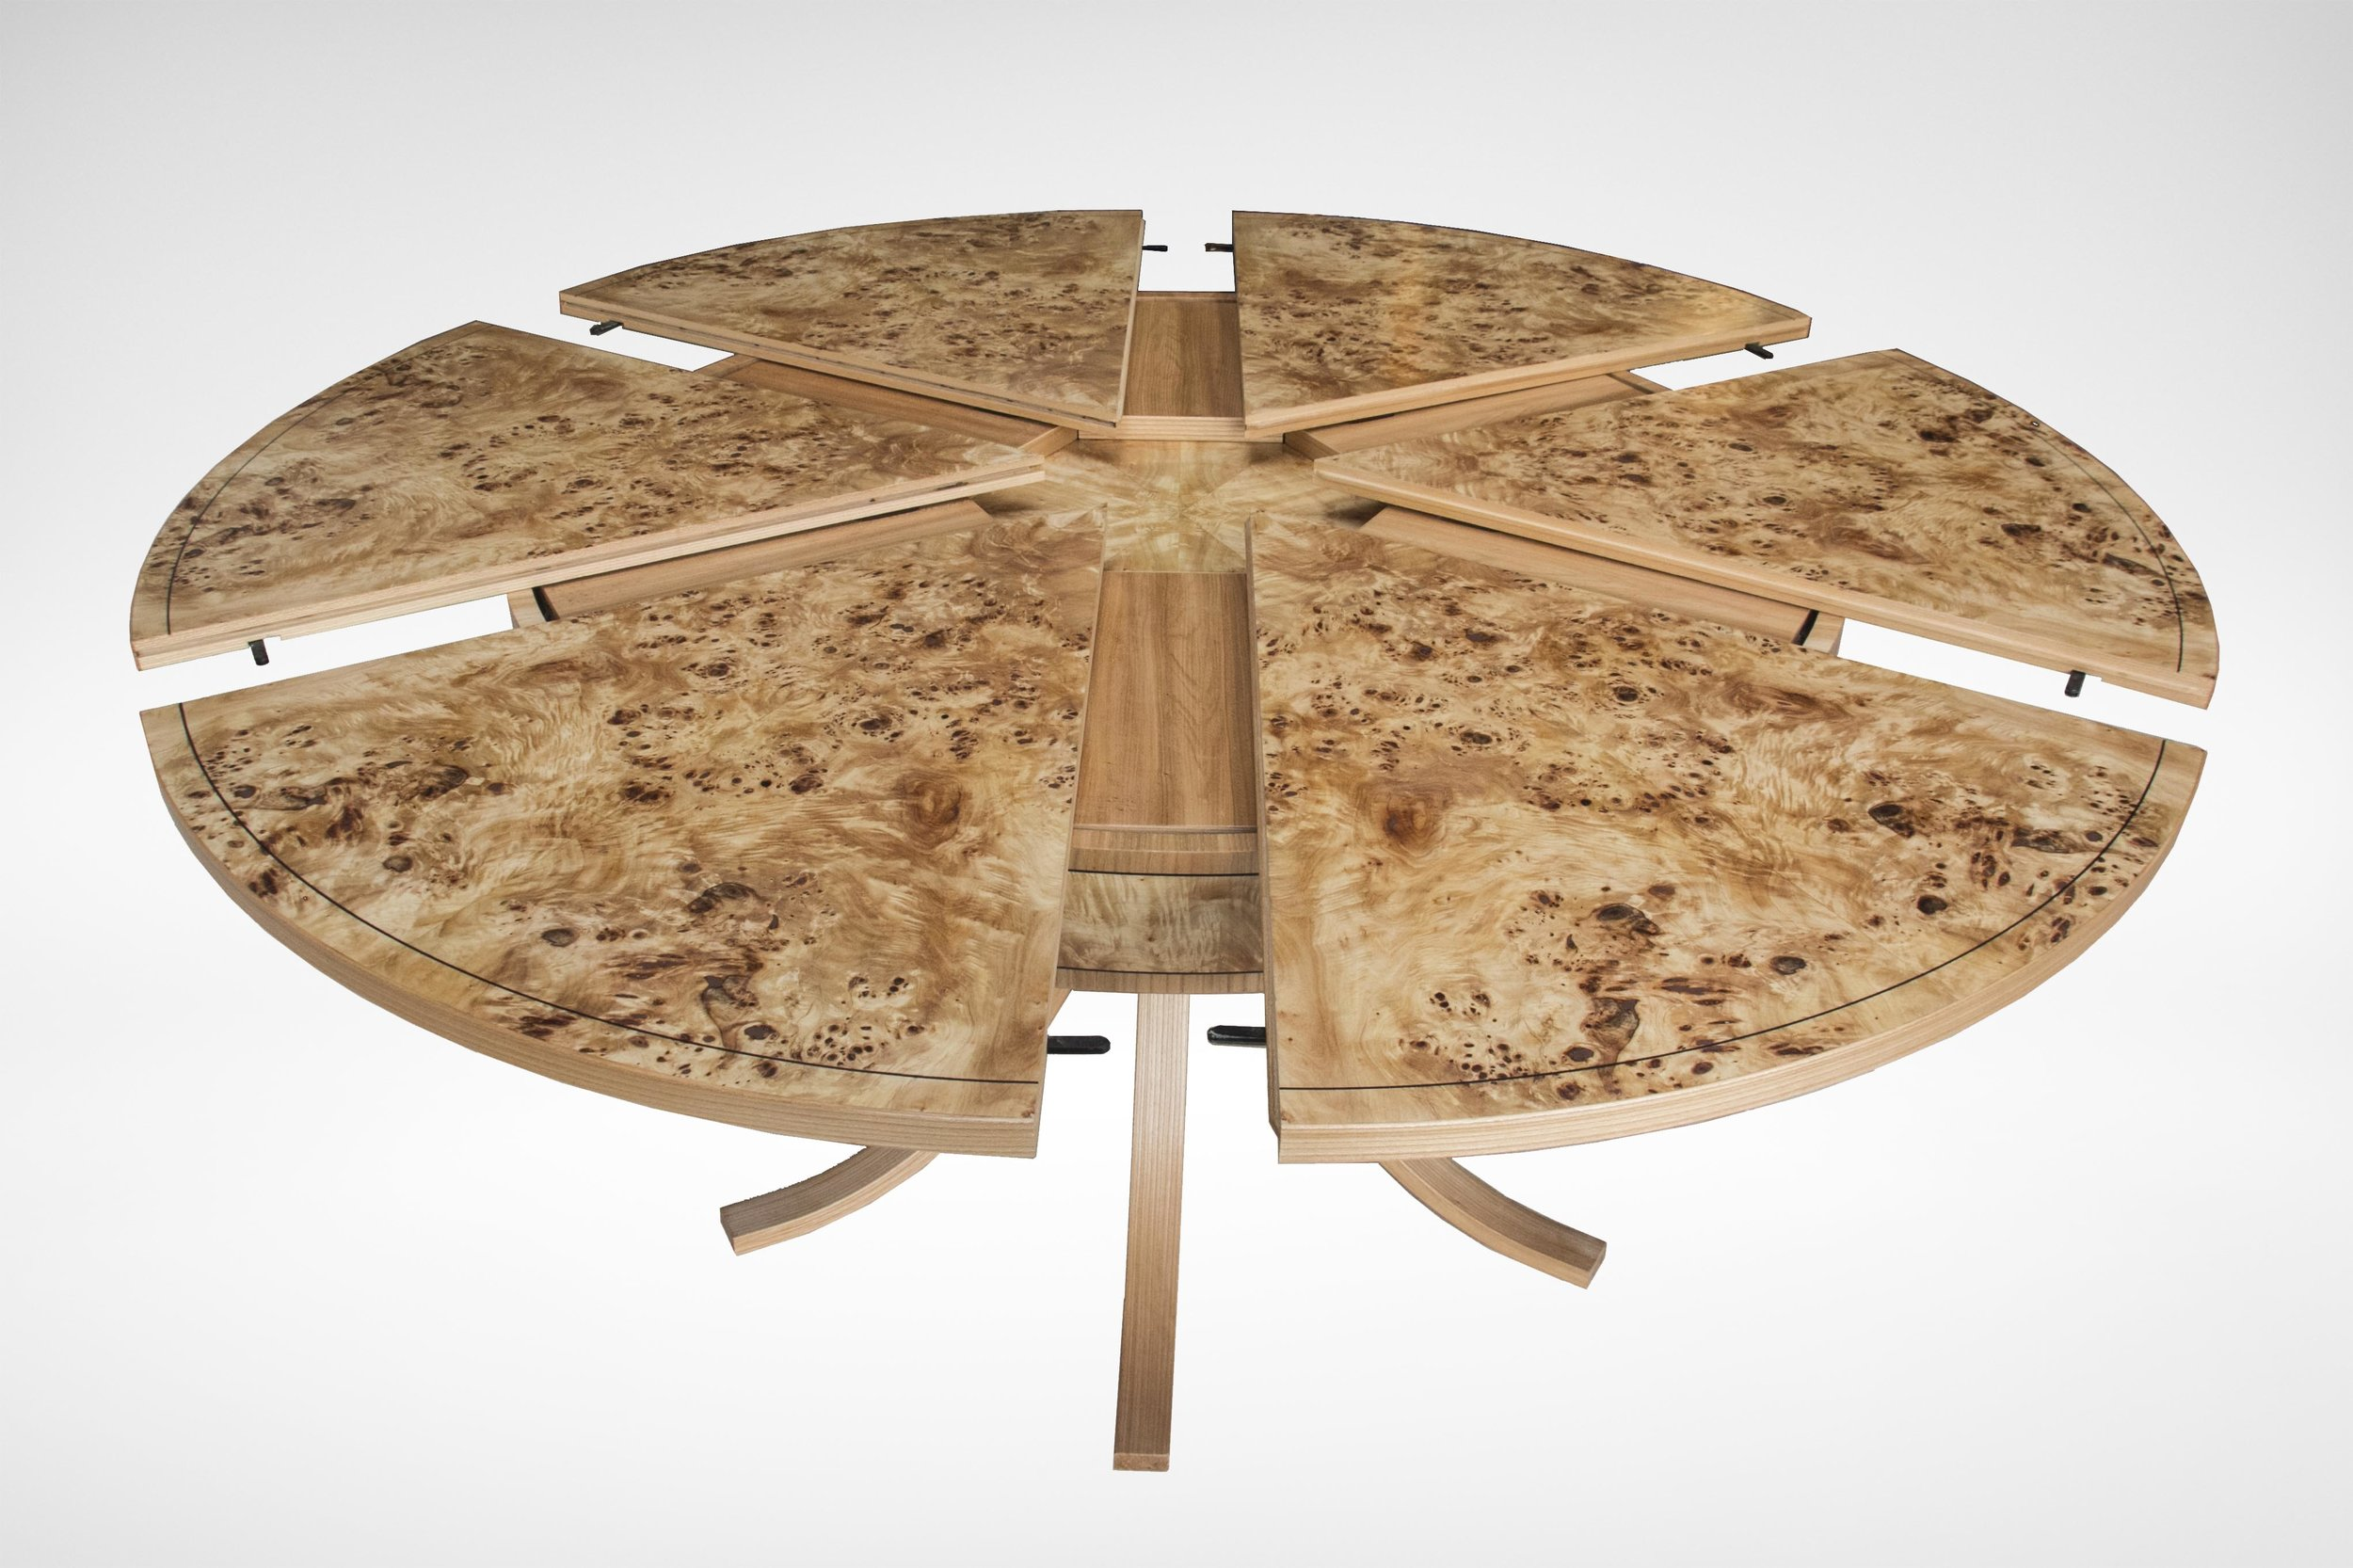 Johnson Furniture - Burr poplar and elm dining table 02.jpg